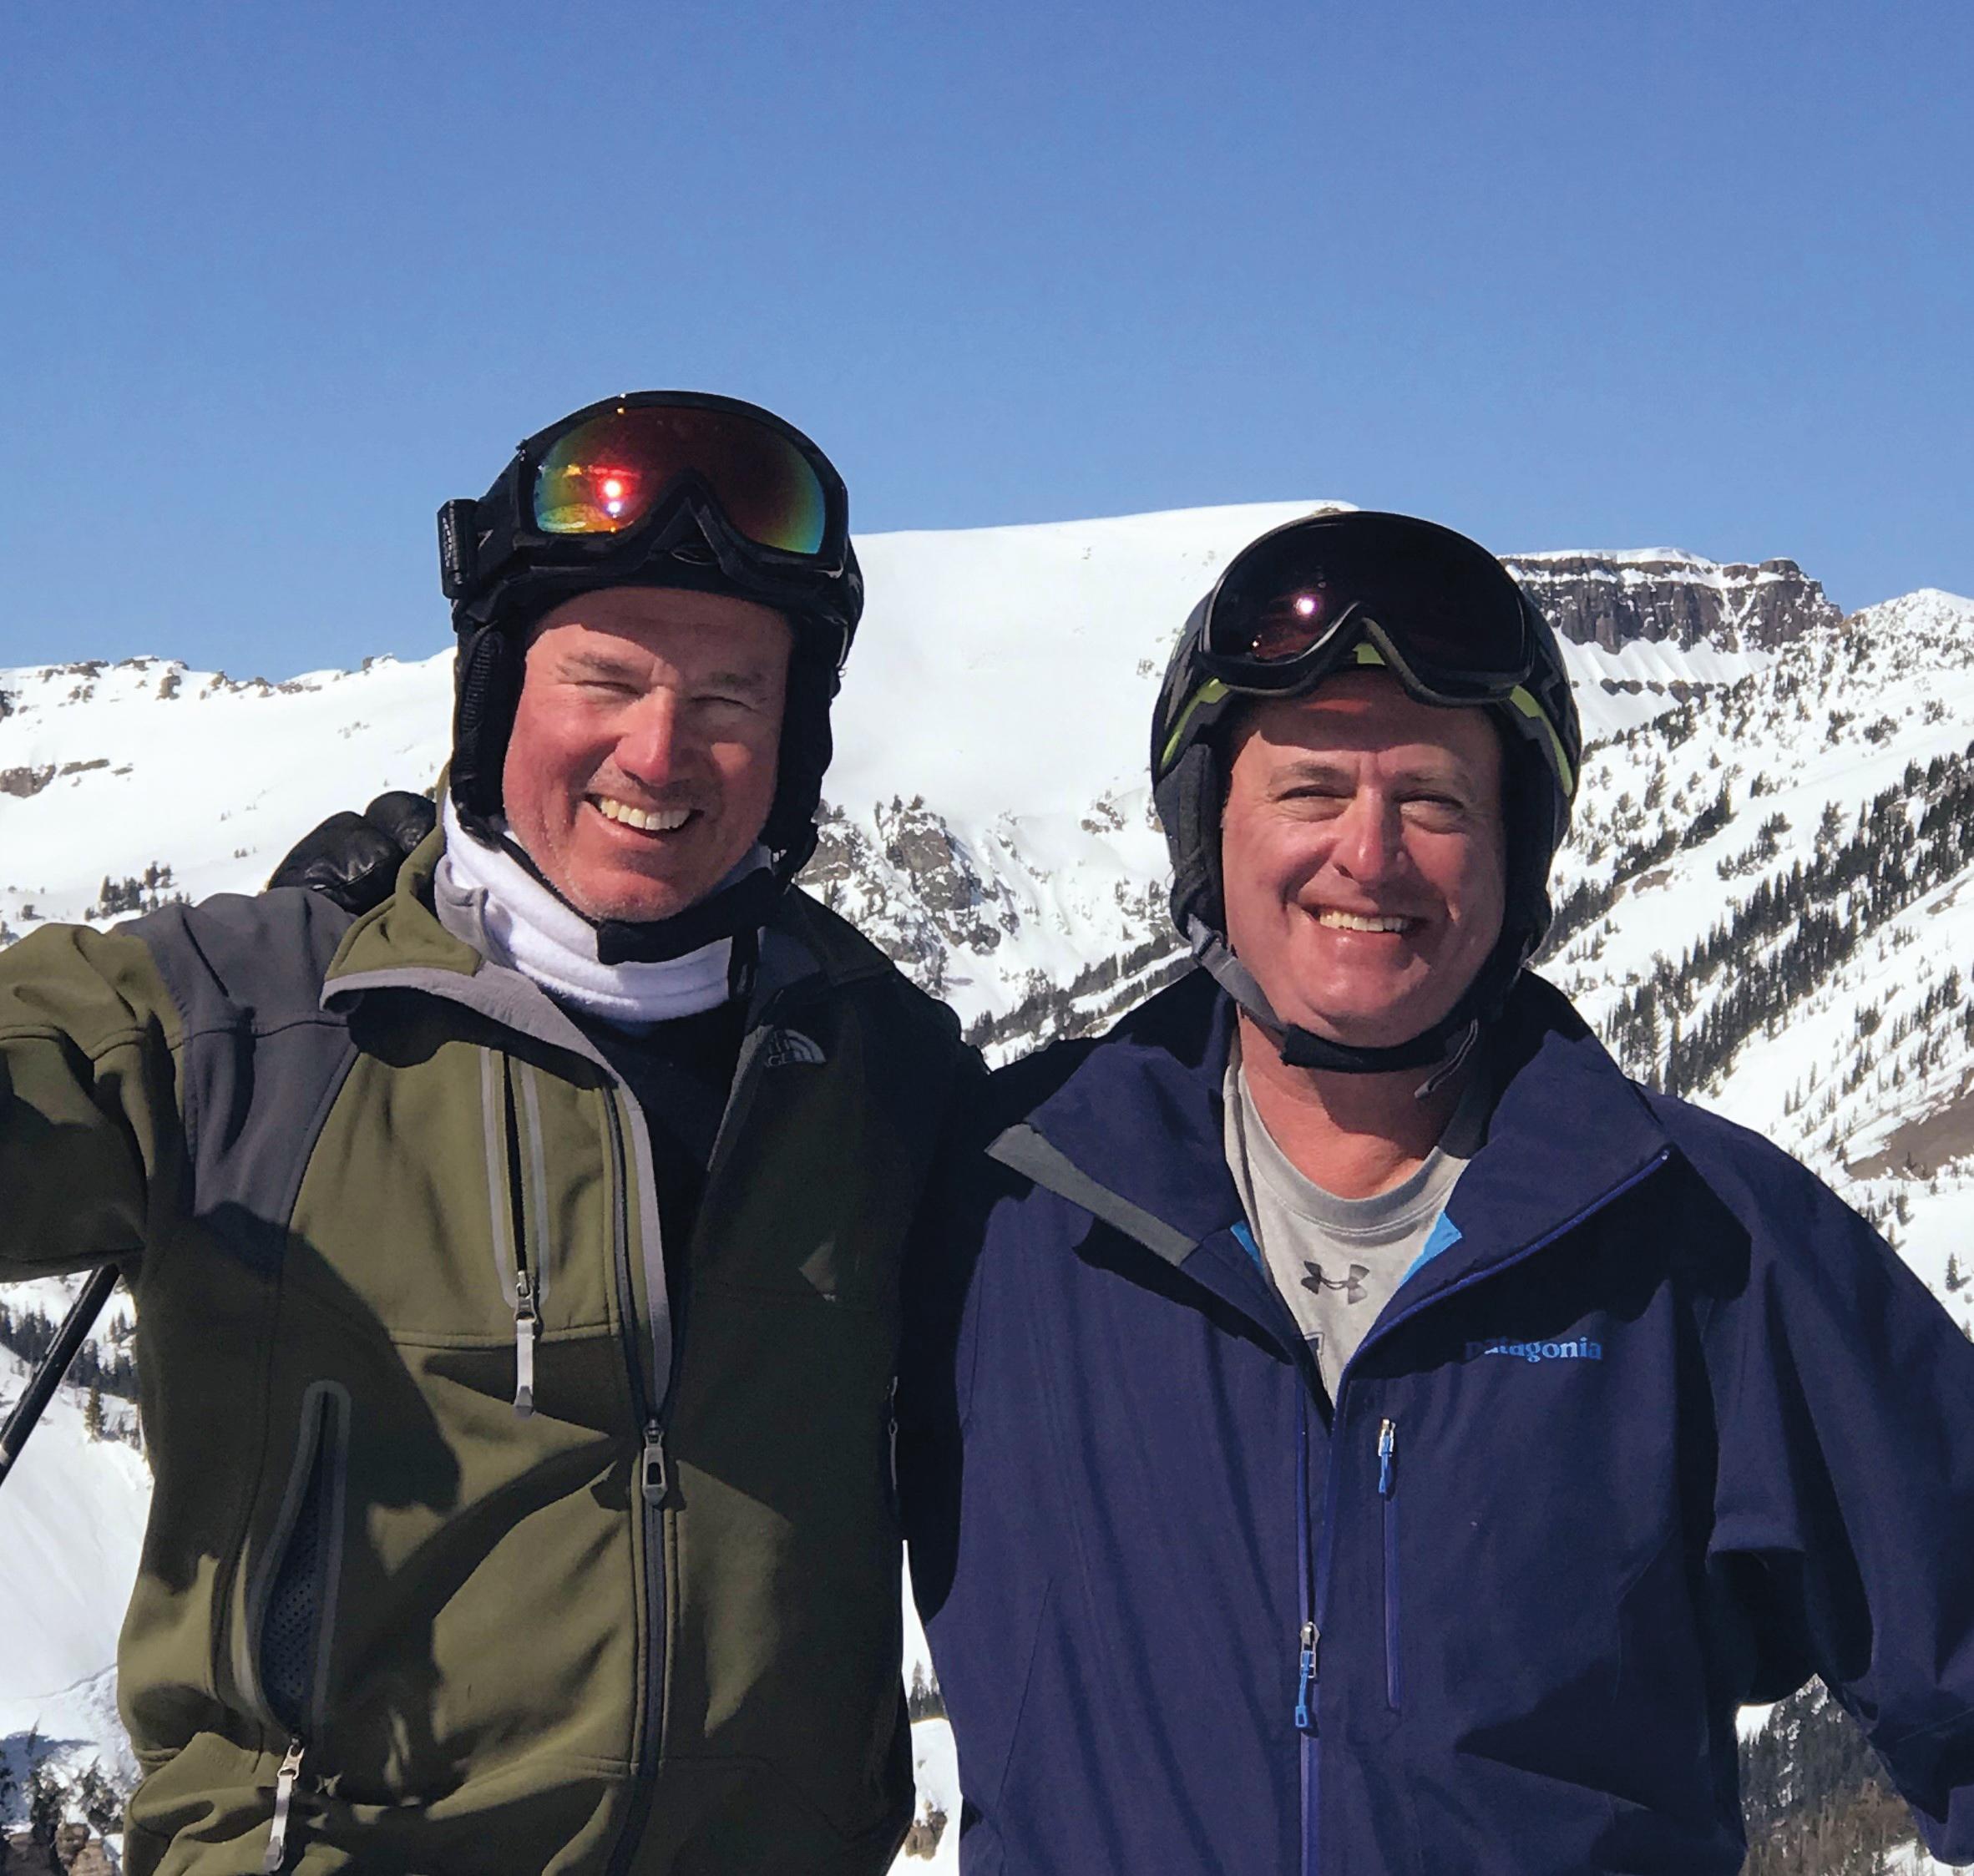 David Scully '79 (l.) and Tim Steinert '78 enjoying Jackson Hole, Wyo.